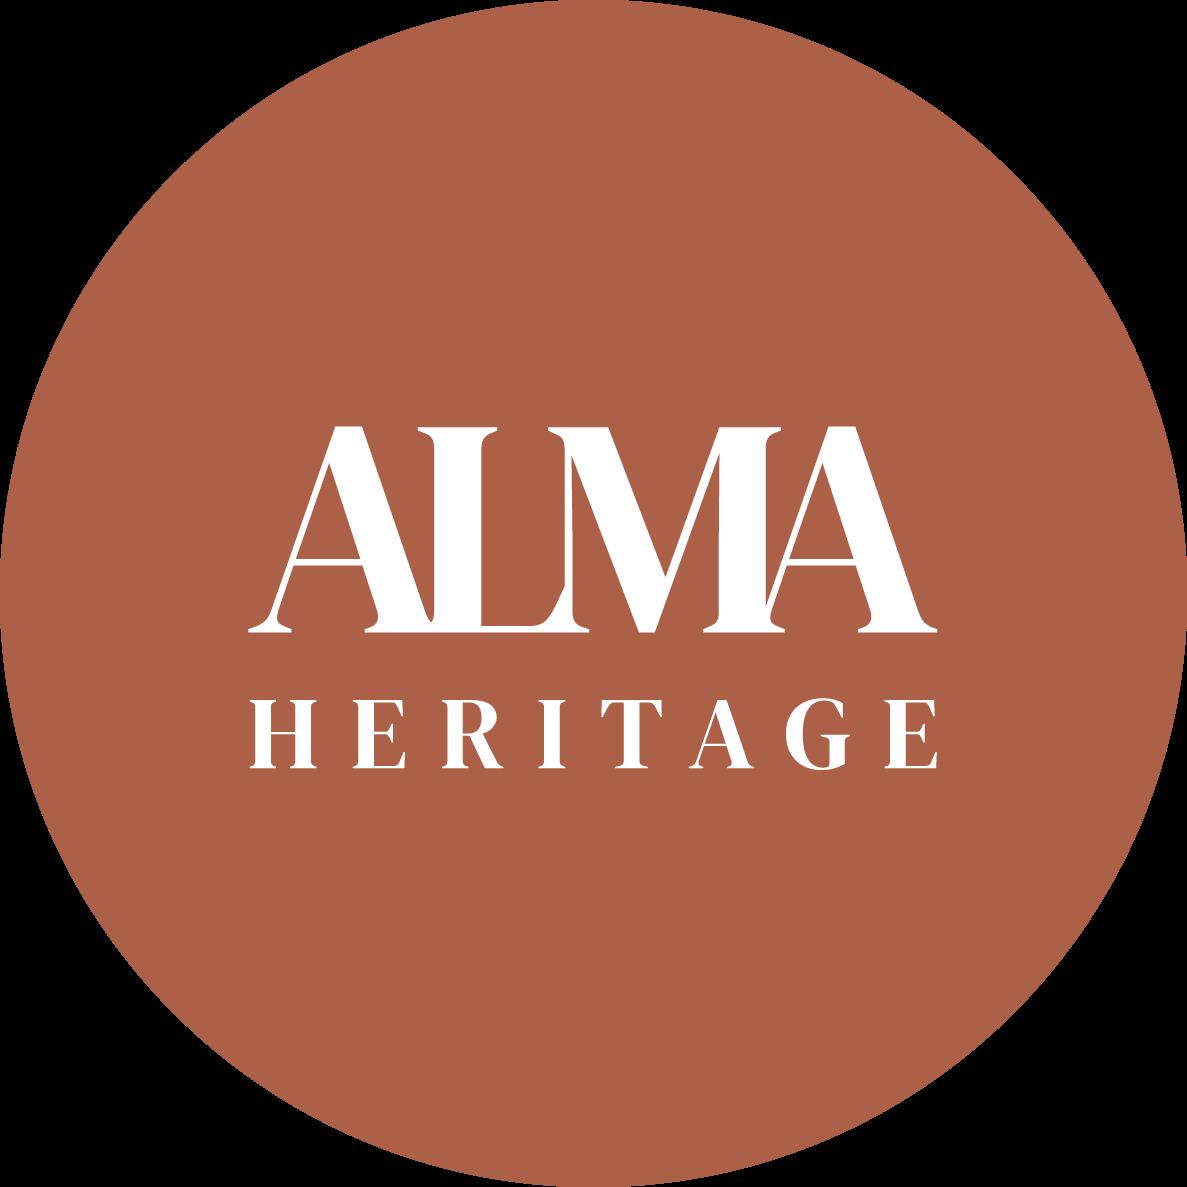 Alma Heritage